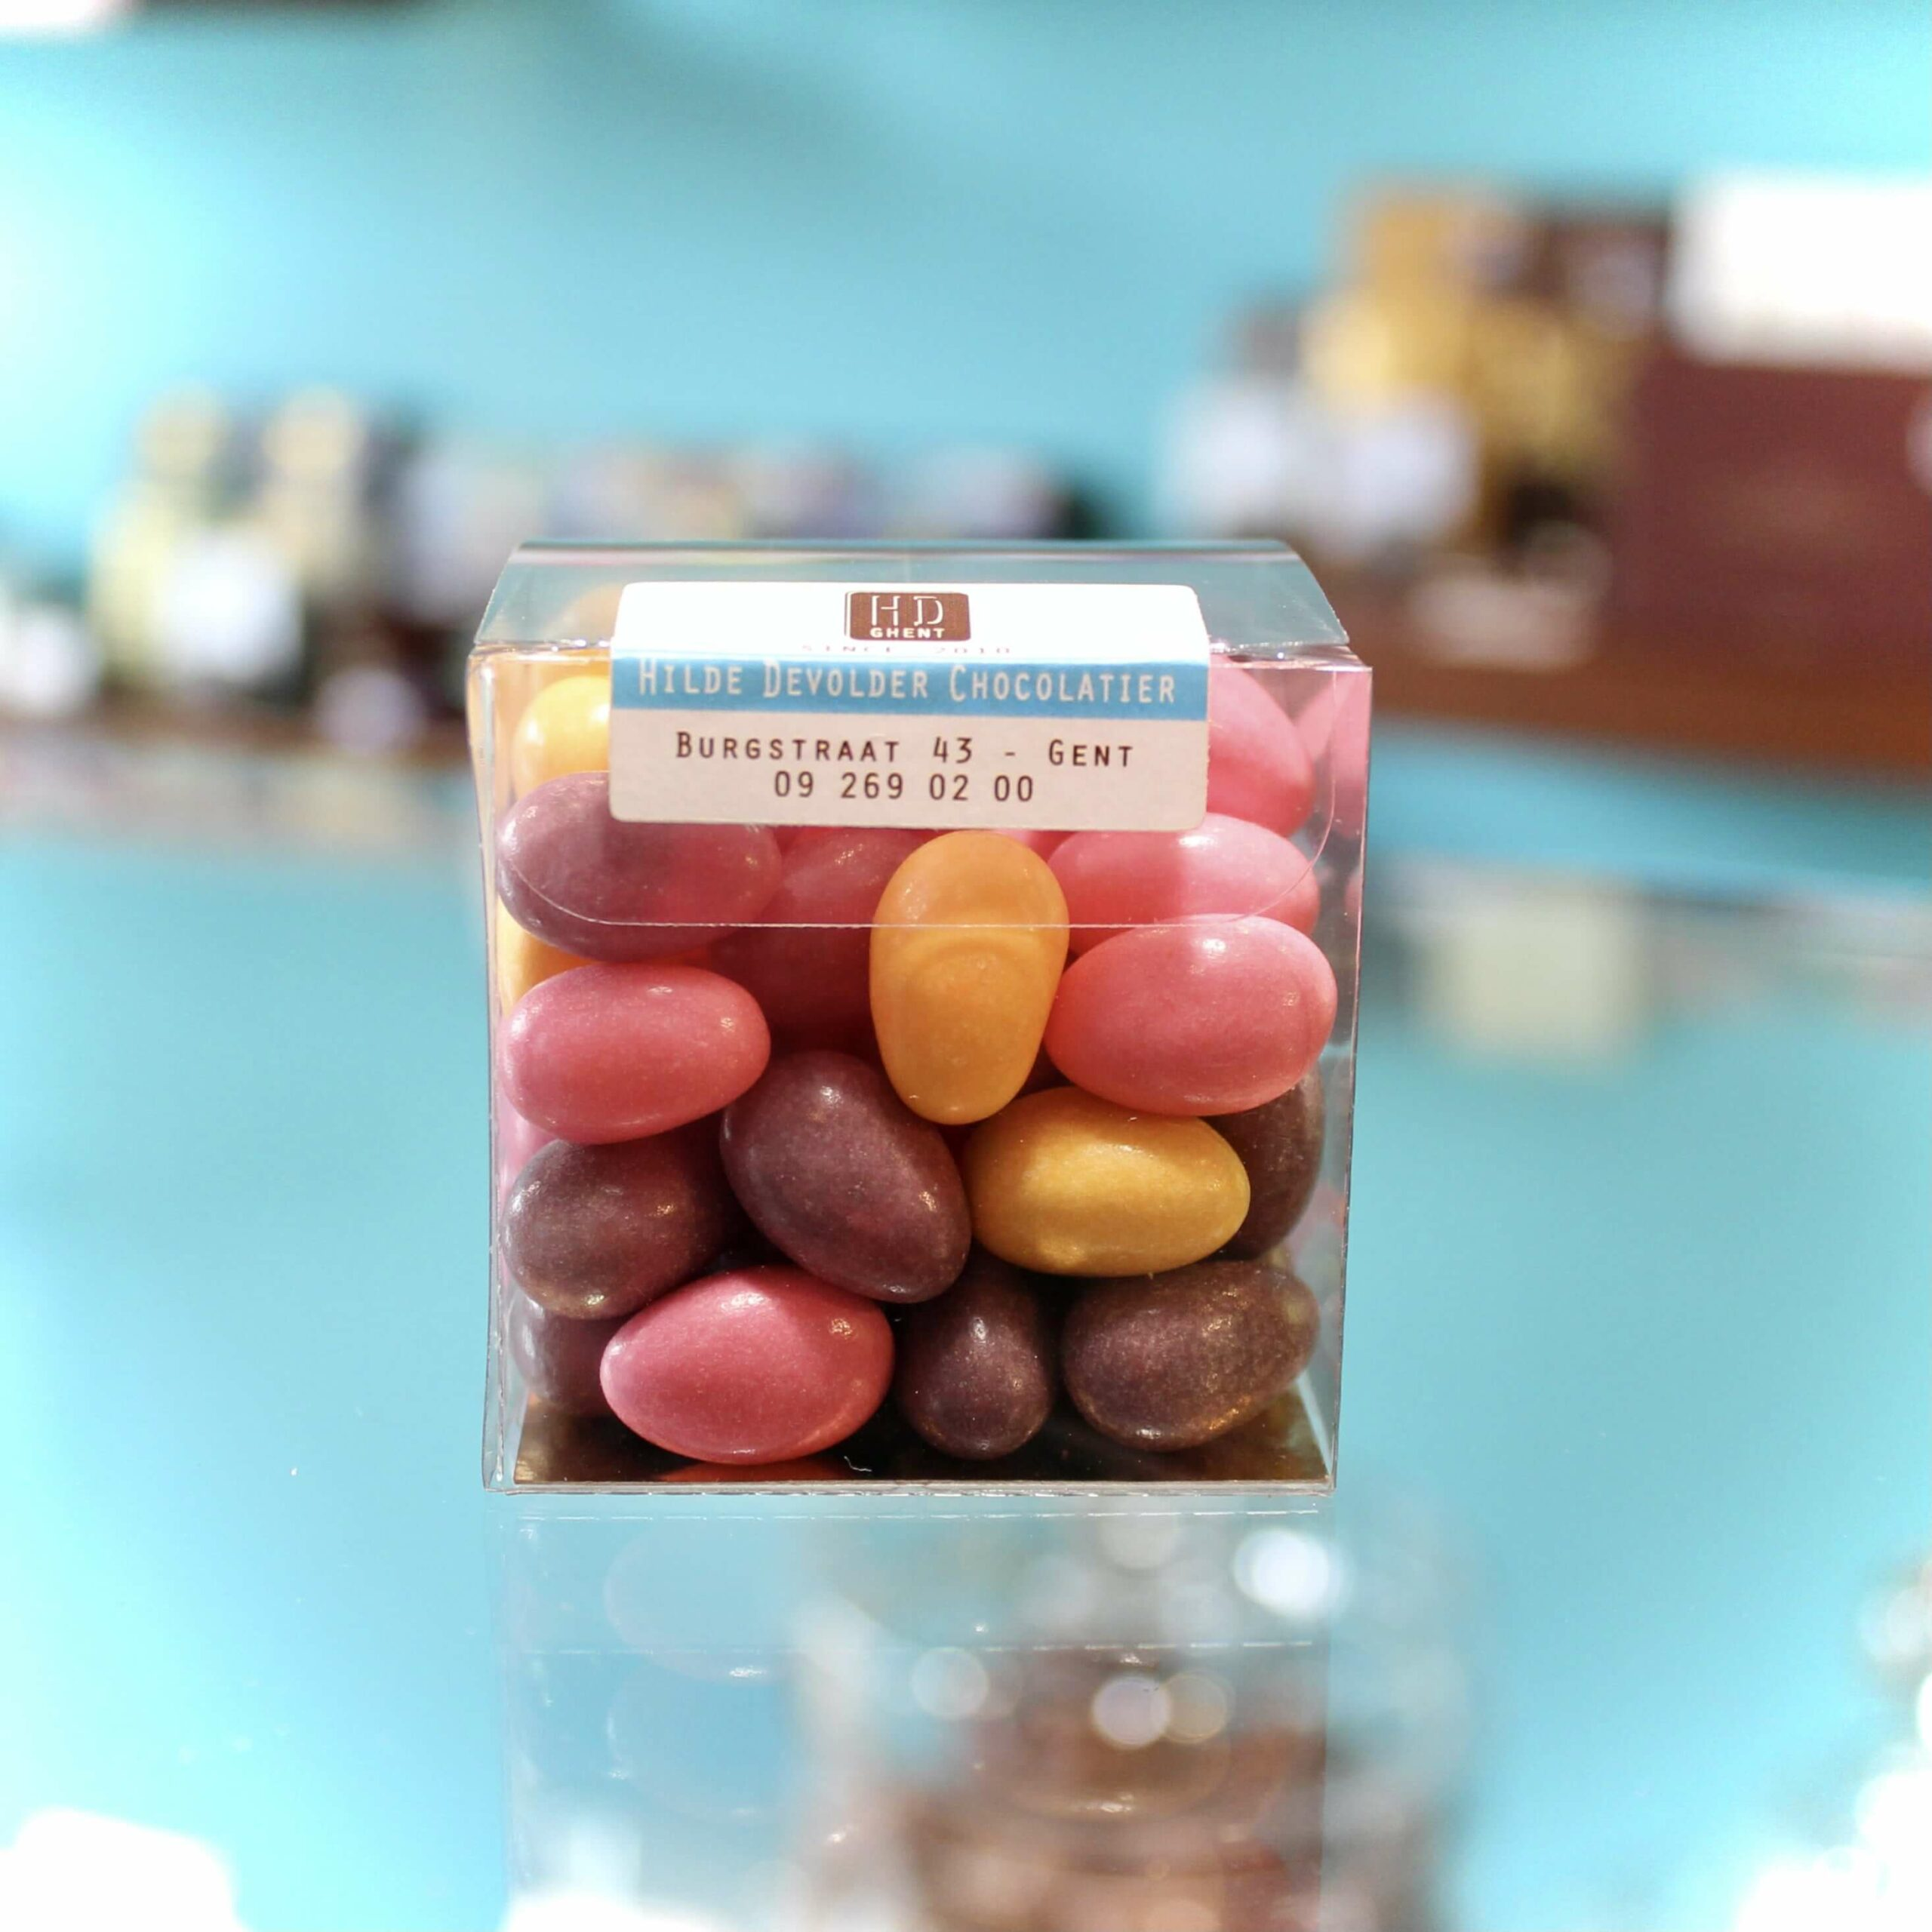 hilde devolder chocolatier sugar pearls with pate de fruits filling